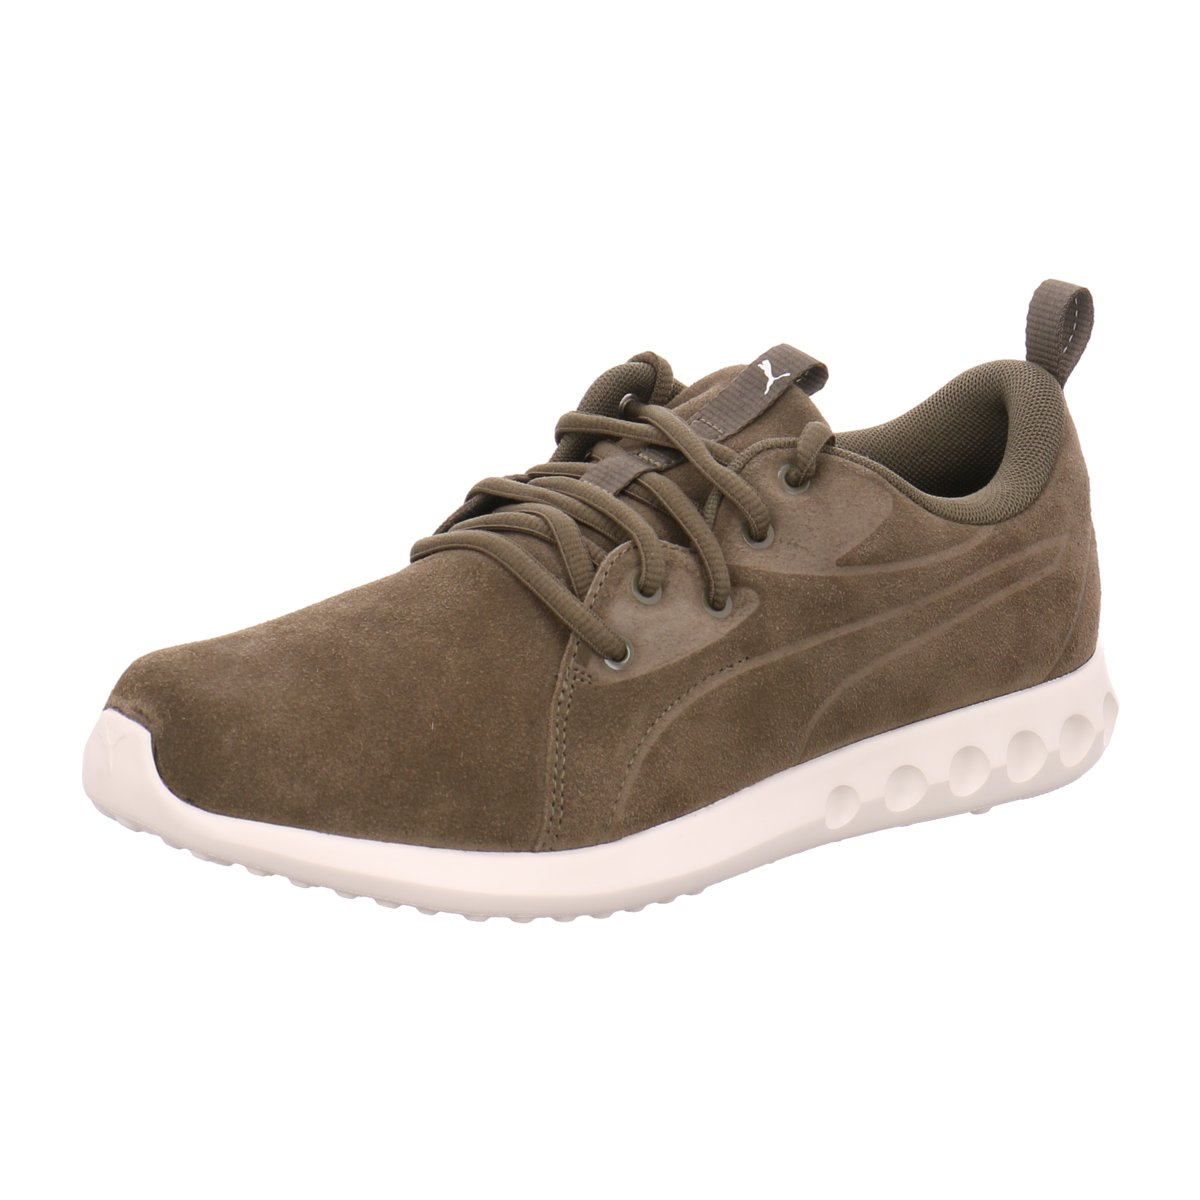 NEU Puma Herren Sneaker NV 190589 oliv 325290